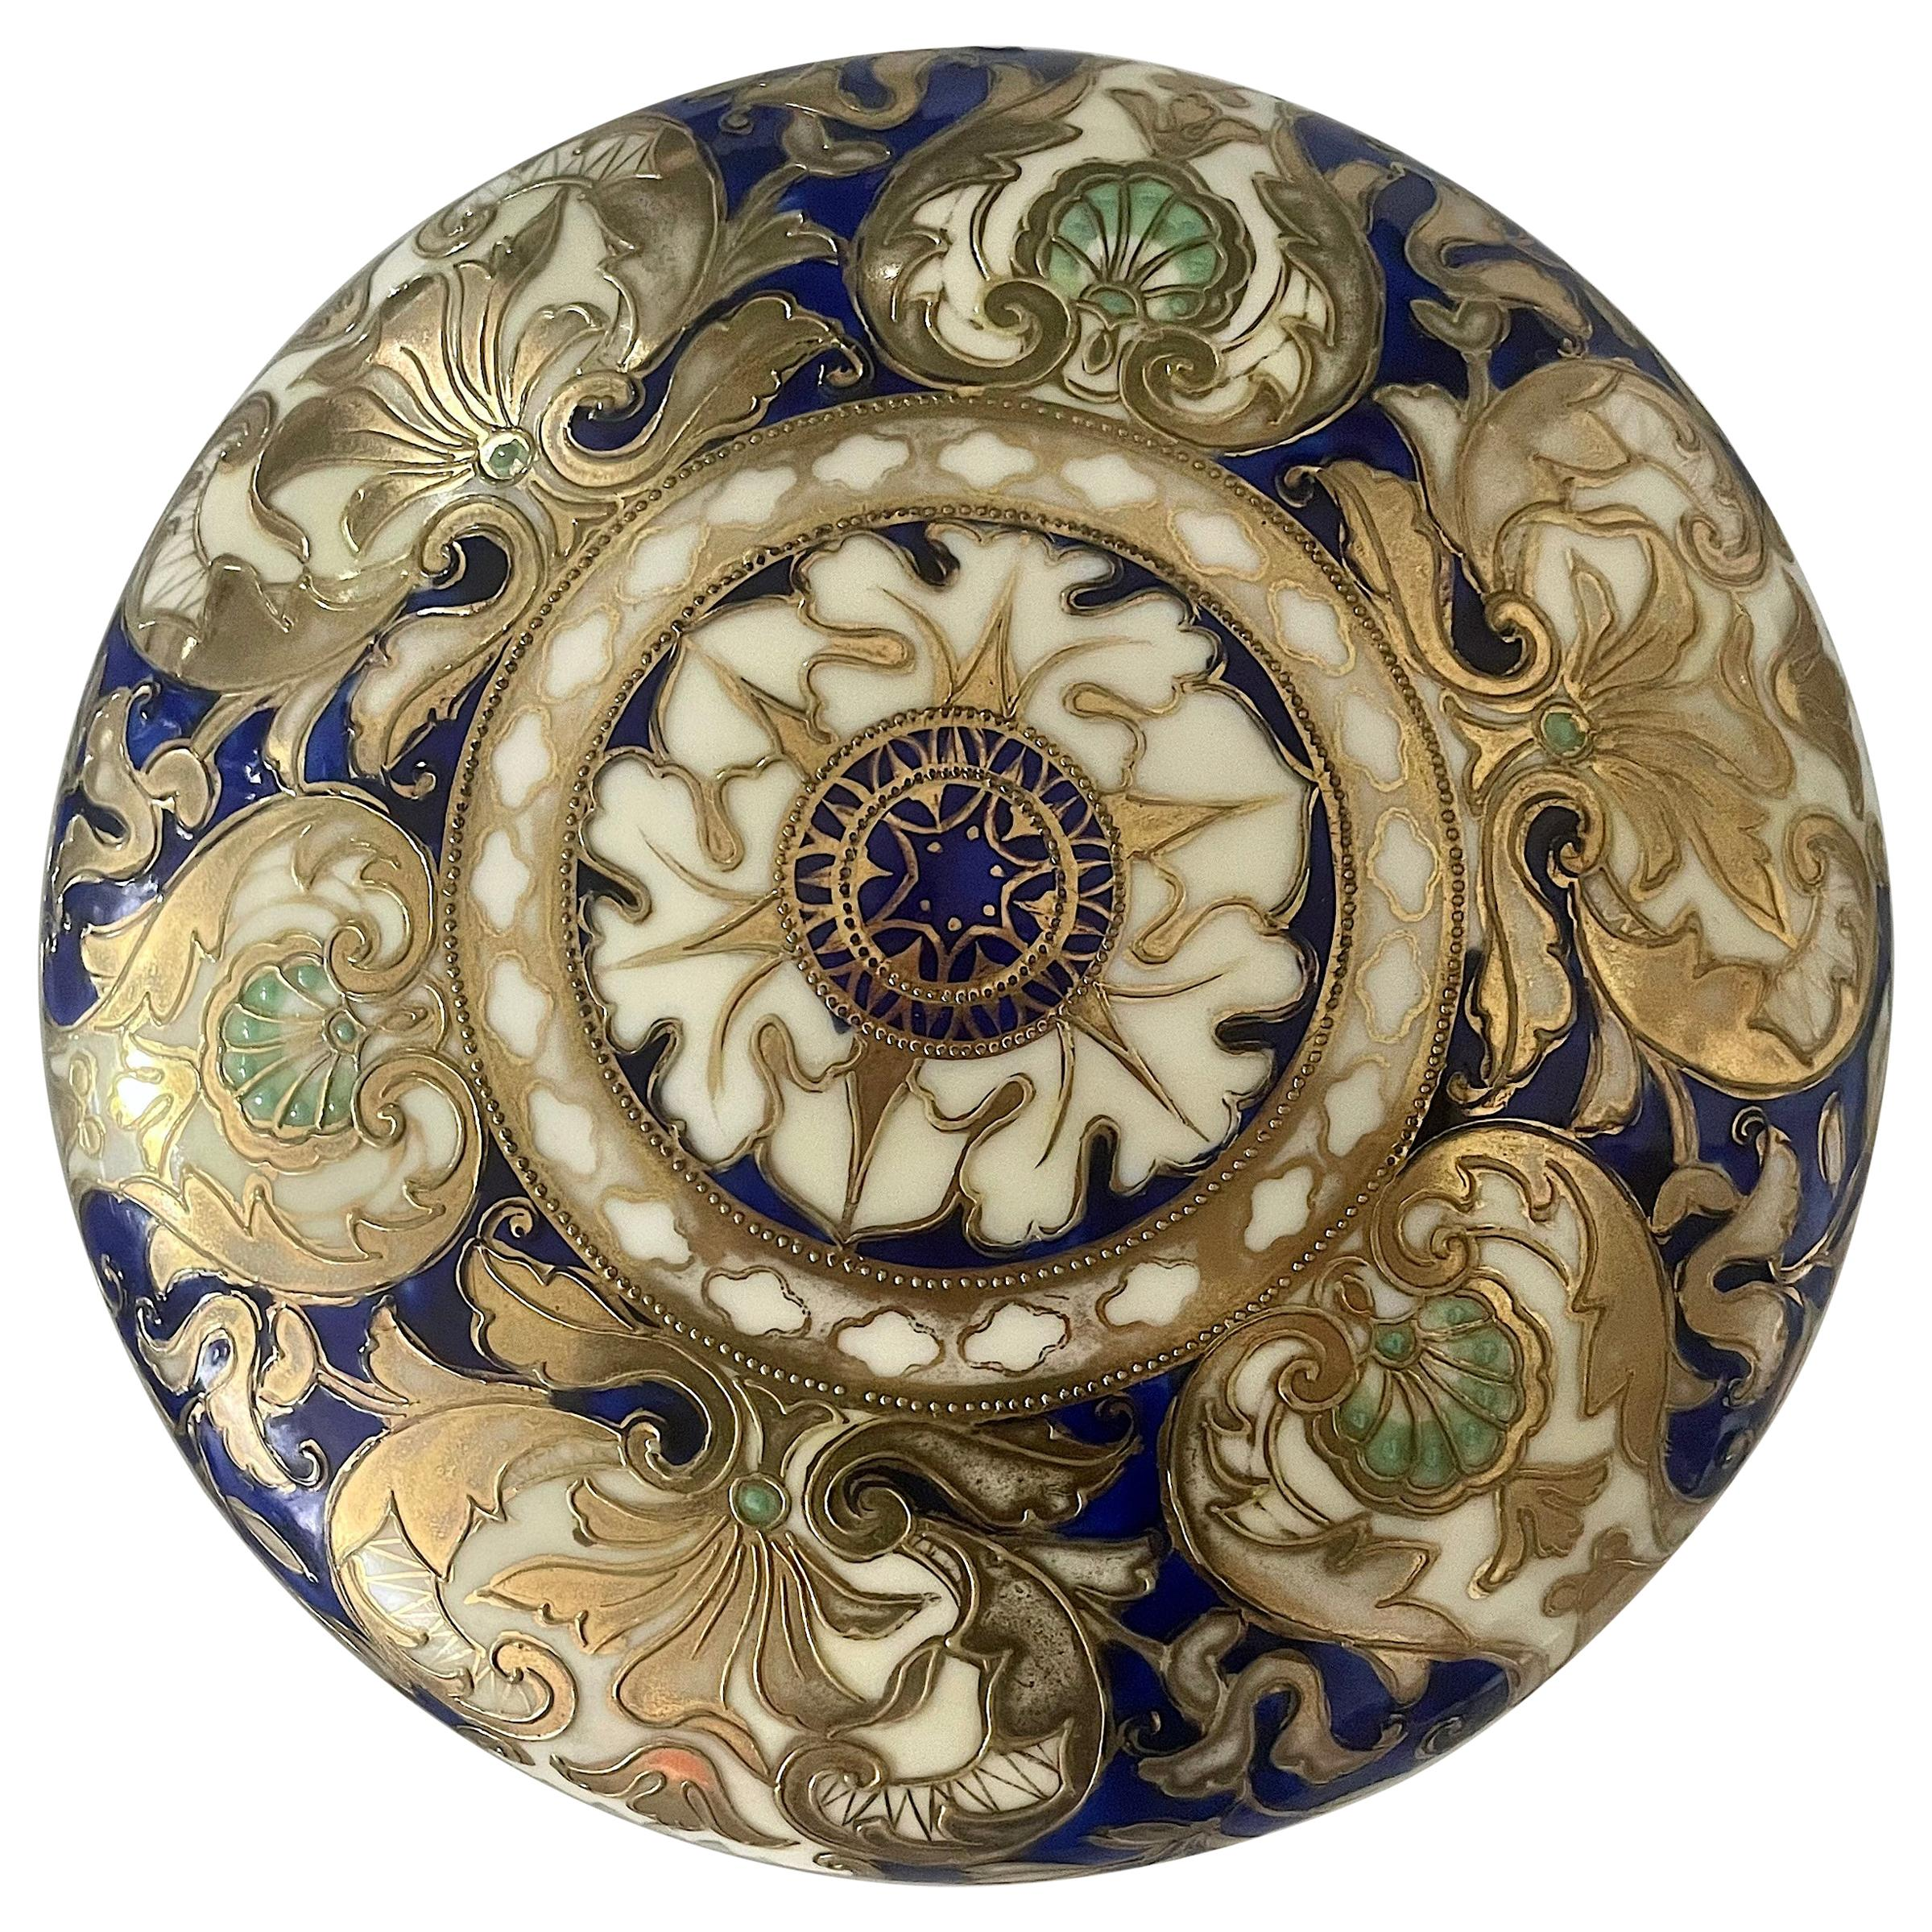 1940's Japanese Porcelain Lidded Bowl by Noritake